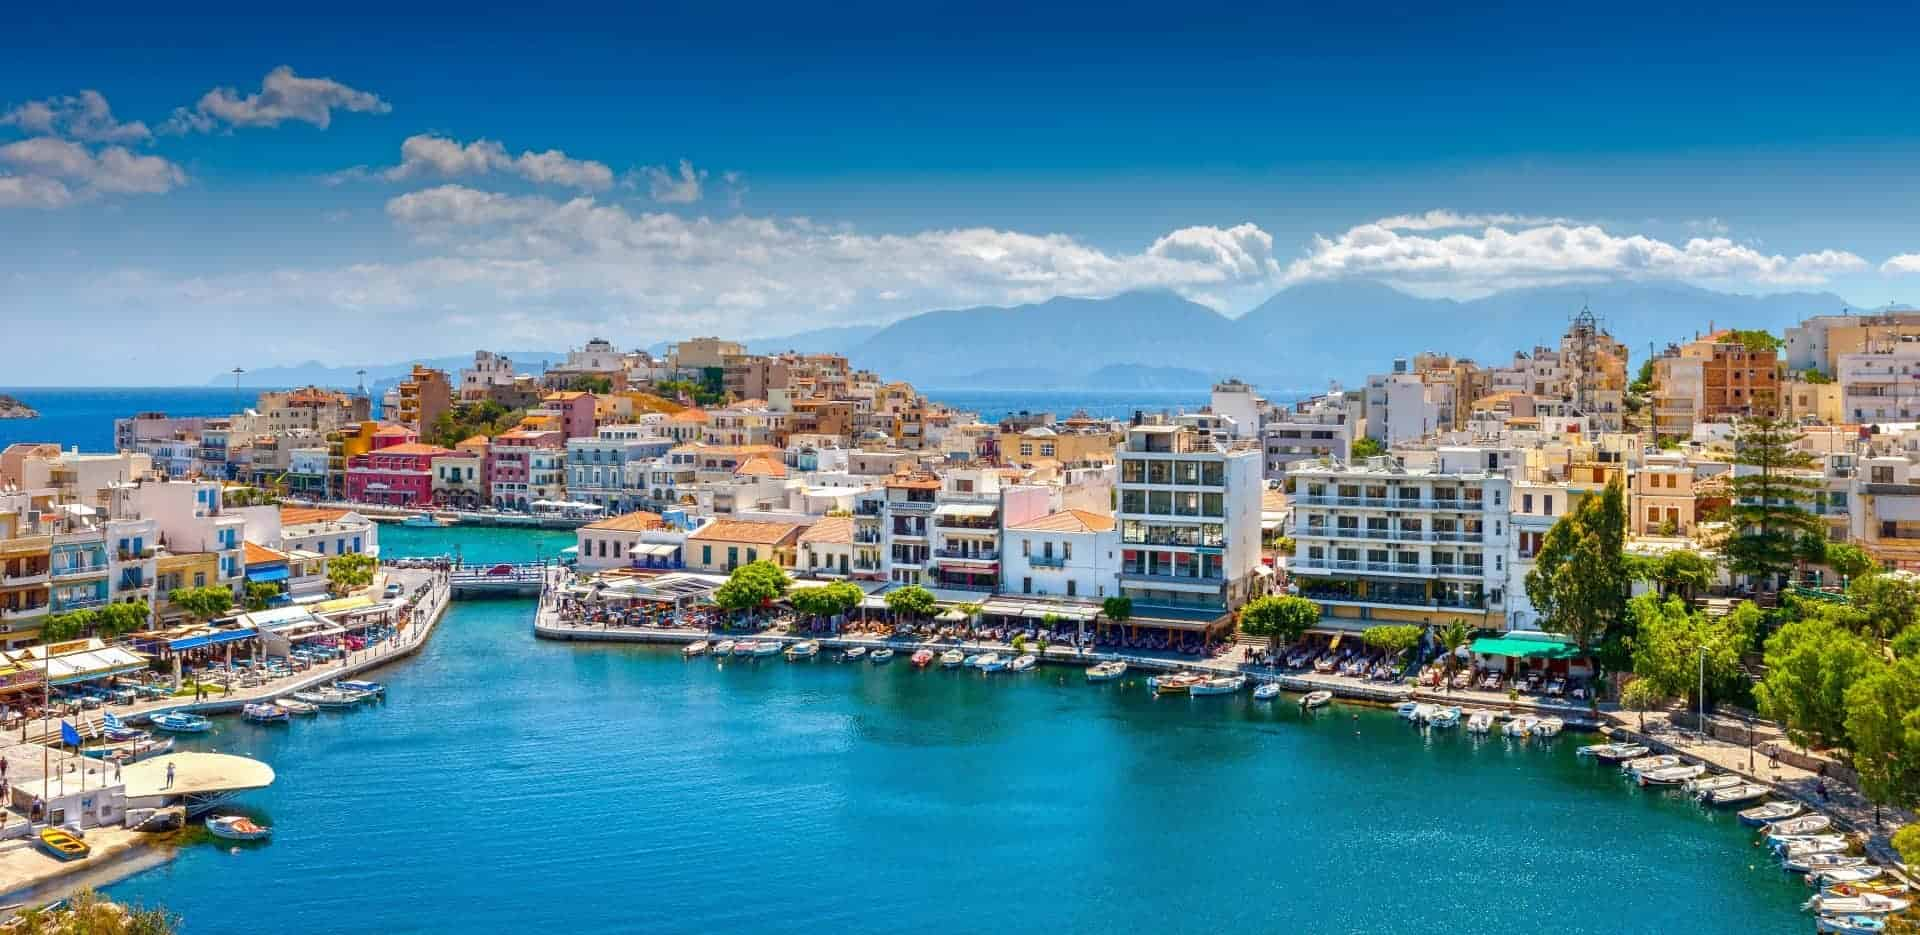 Eastern Mediterranean Islands